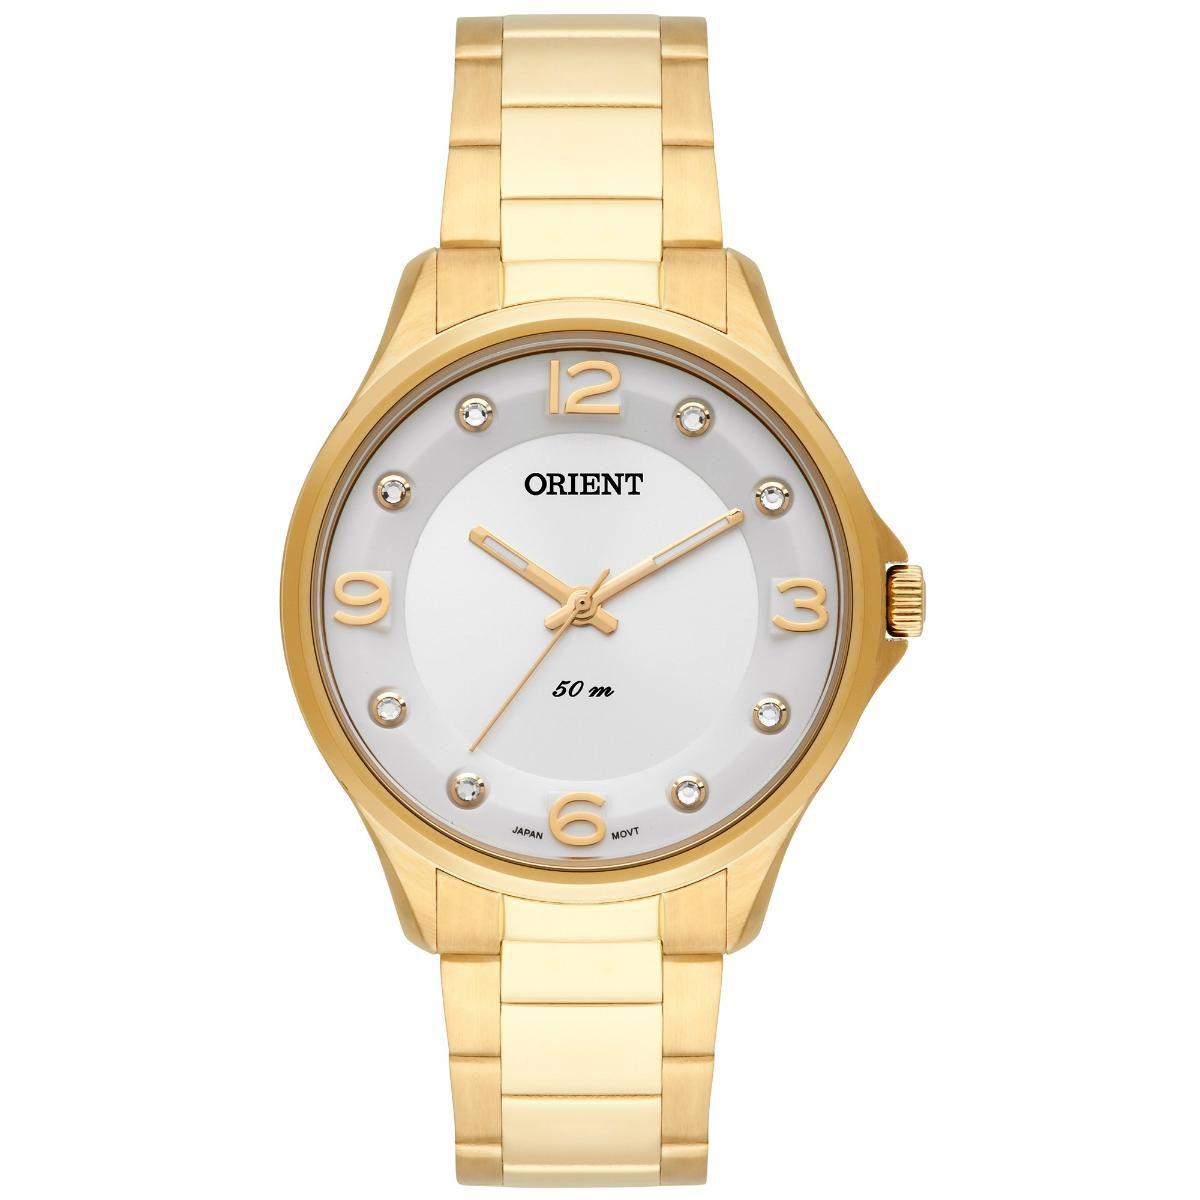 Relógio Feminino Orient FGSS0069-S2KX 36 mm Aço Dourado